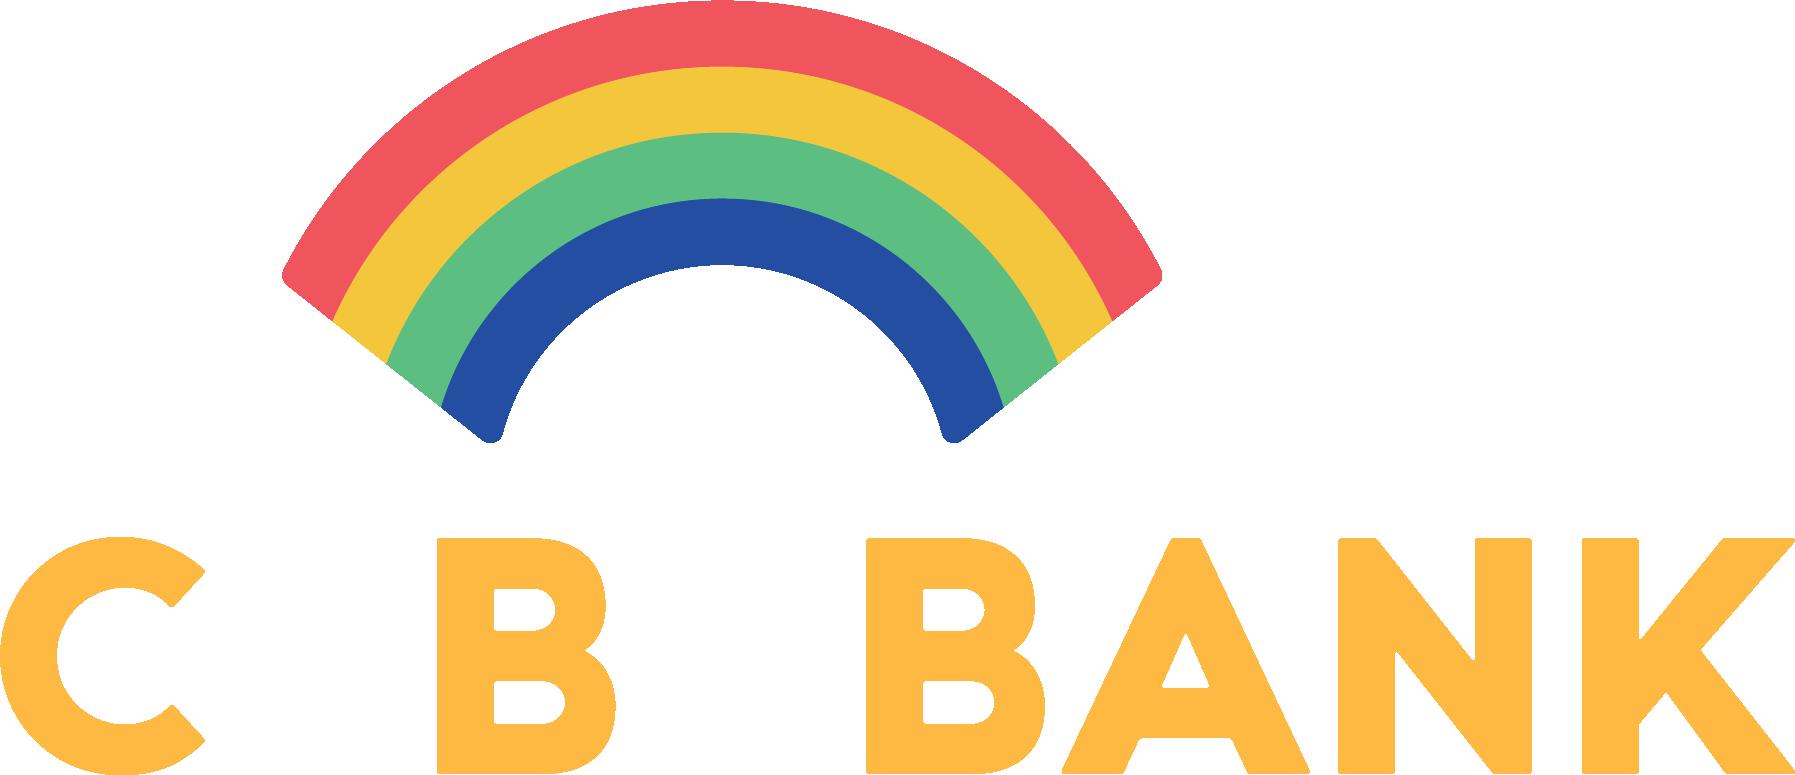 CB Bank Logo